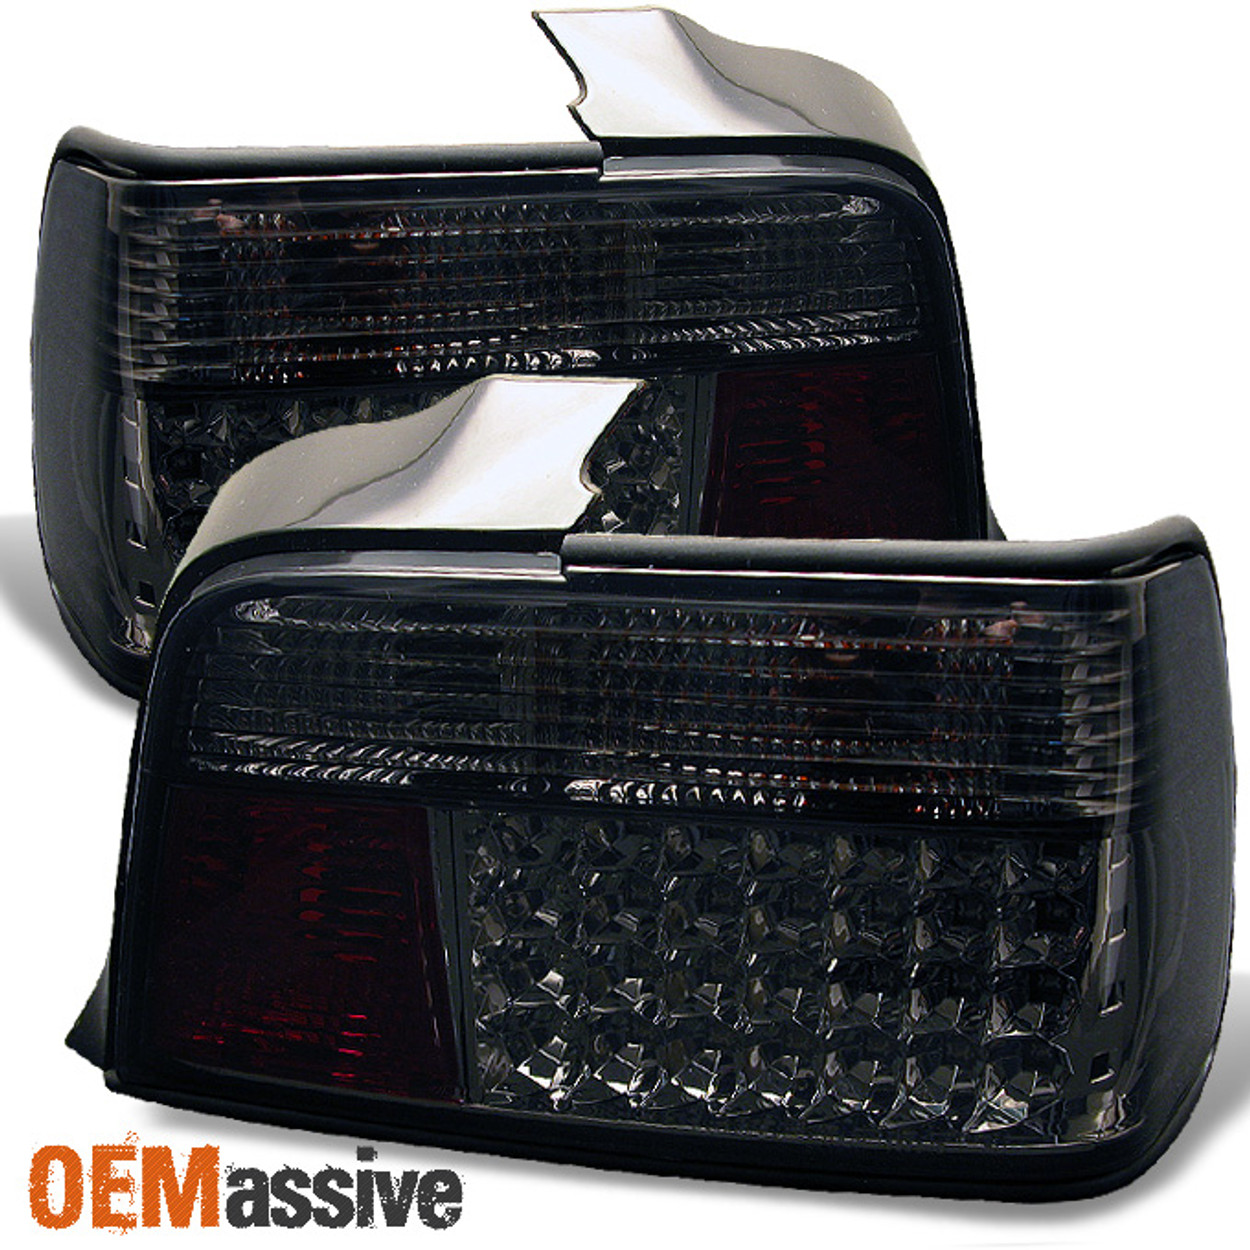 Fits Smoked 92 98 Bmw E36 3 Series 4dr Sedan Jdm Led Tail Lights Lamp Left Right Oemassive